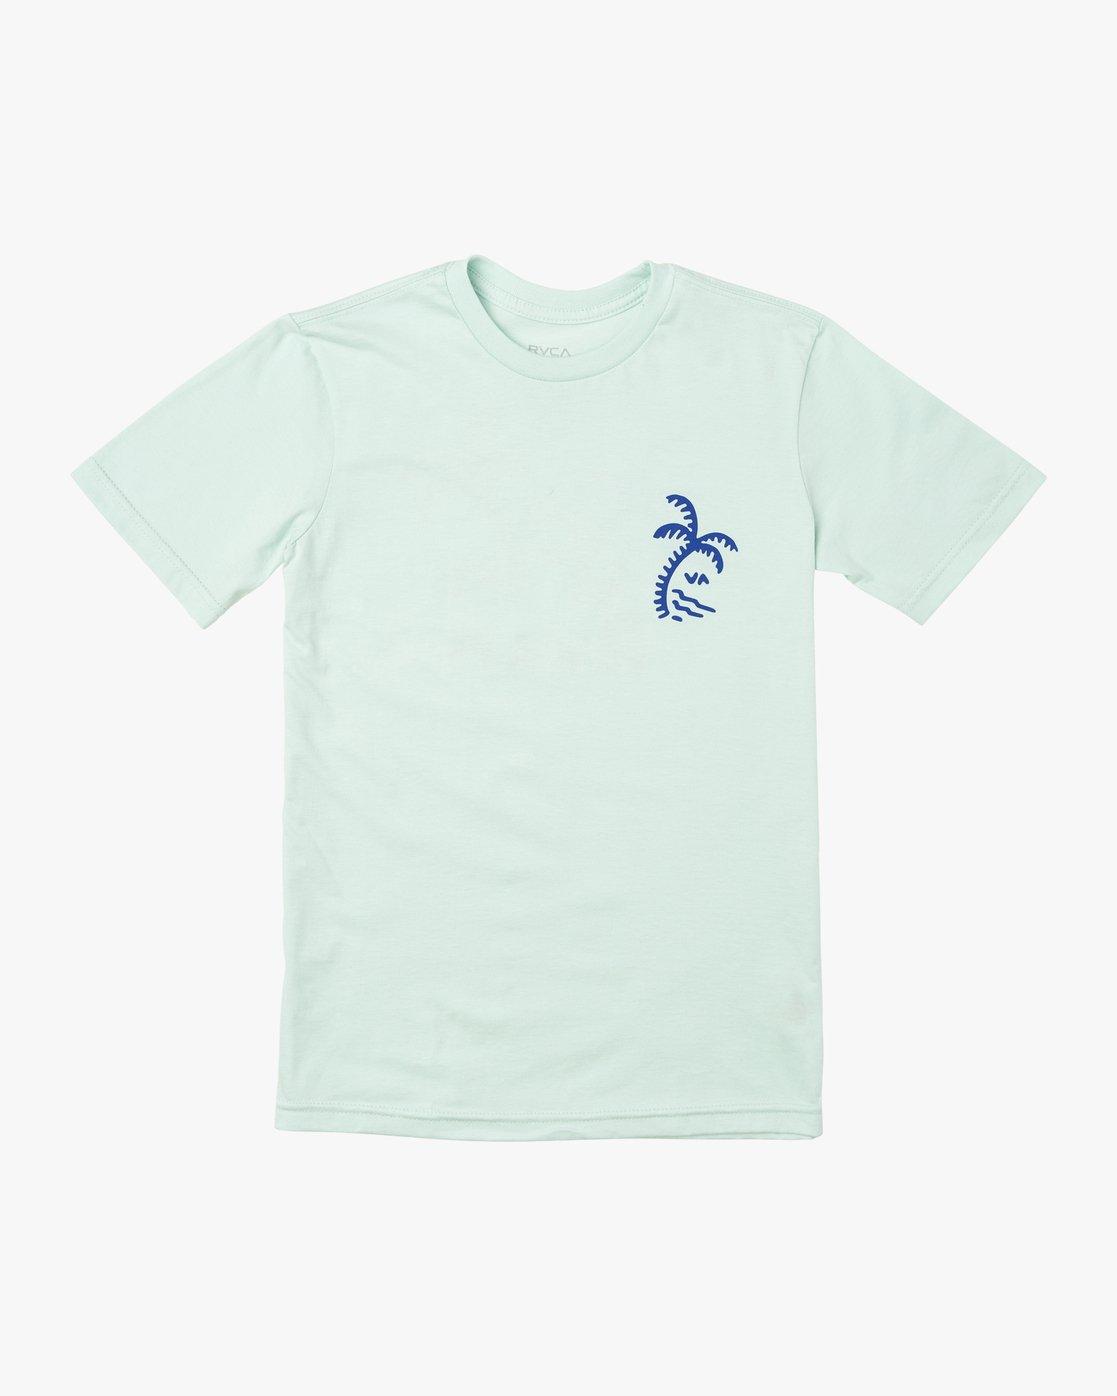 0 BOY'S PALMER T-SHIRT Blue B4011RPA RVCA